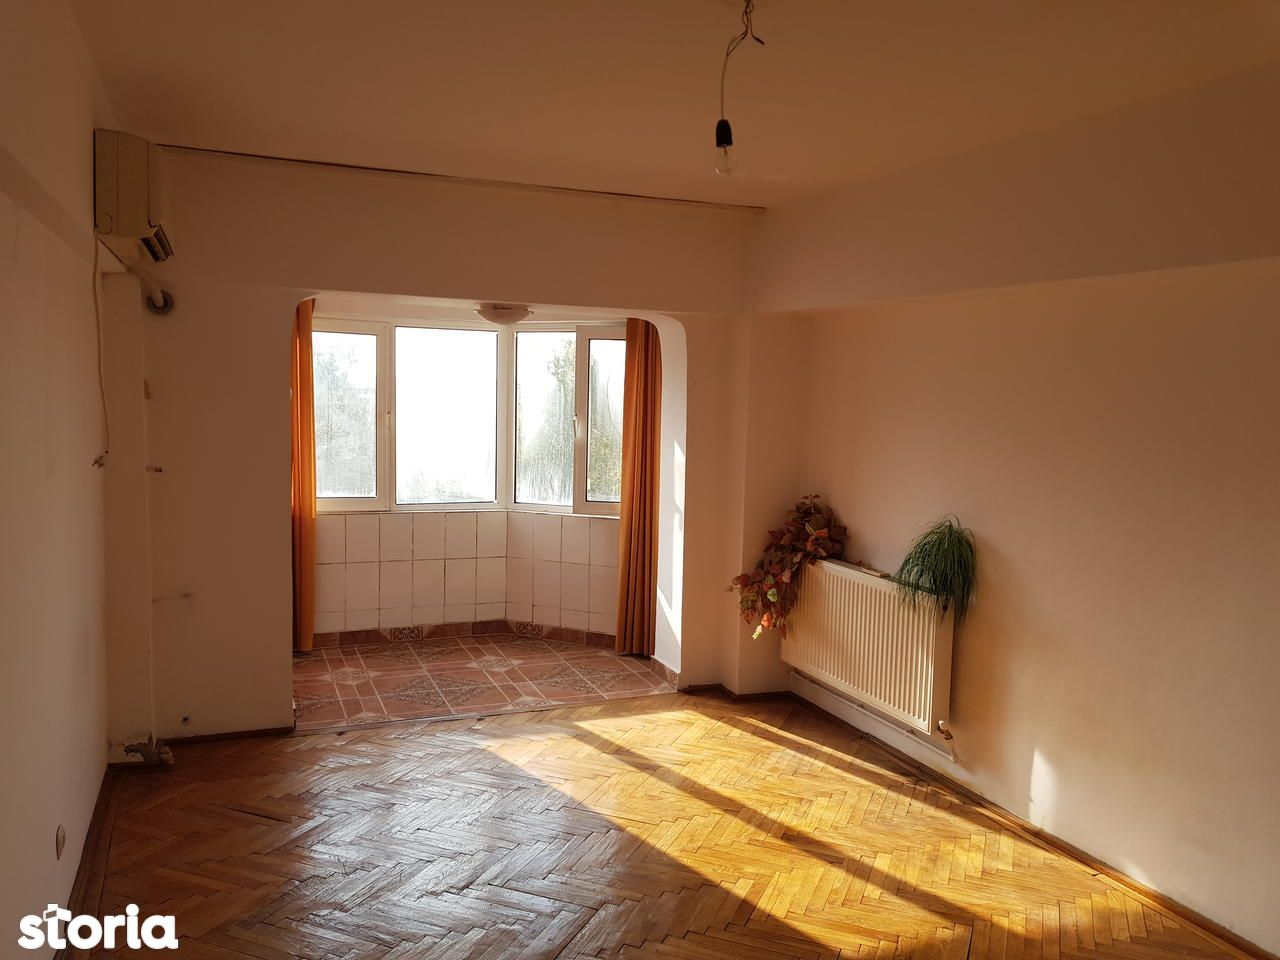 Apartament de vanzare, Constanța (judet), Bulevardul Aurel Vlaicu - Foto 2